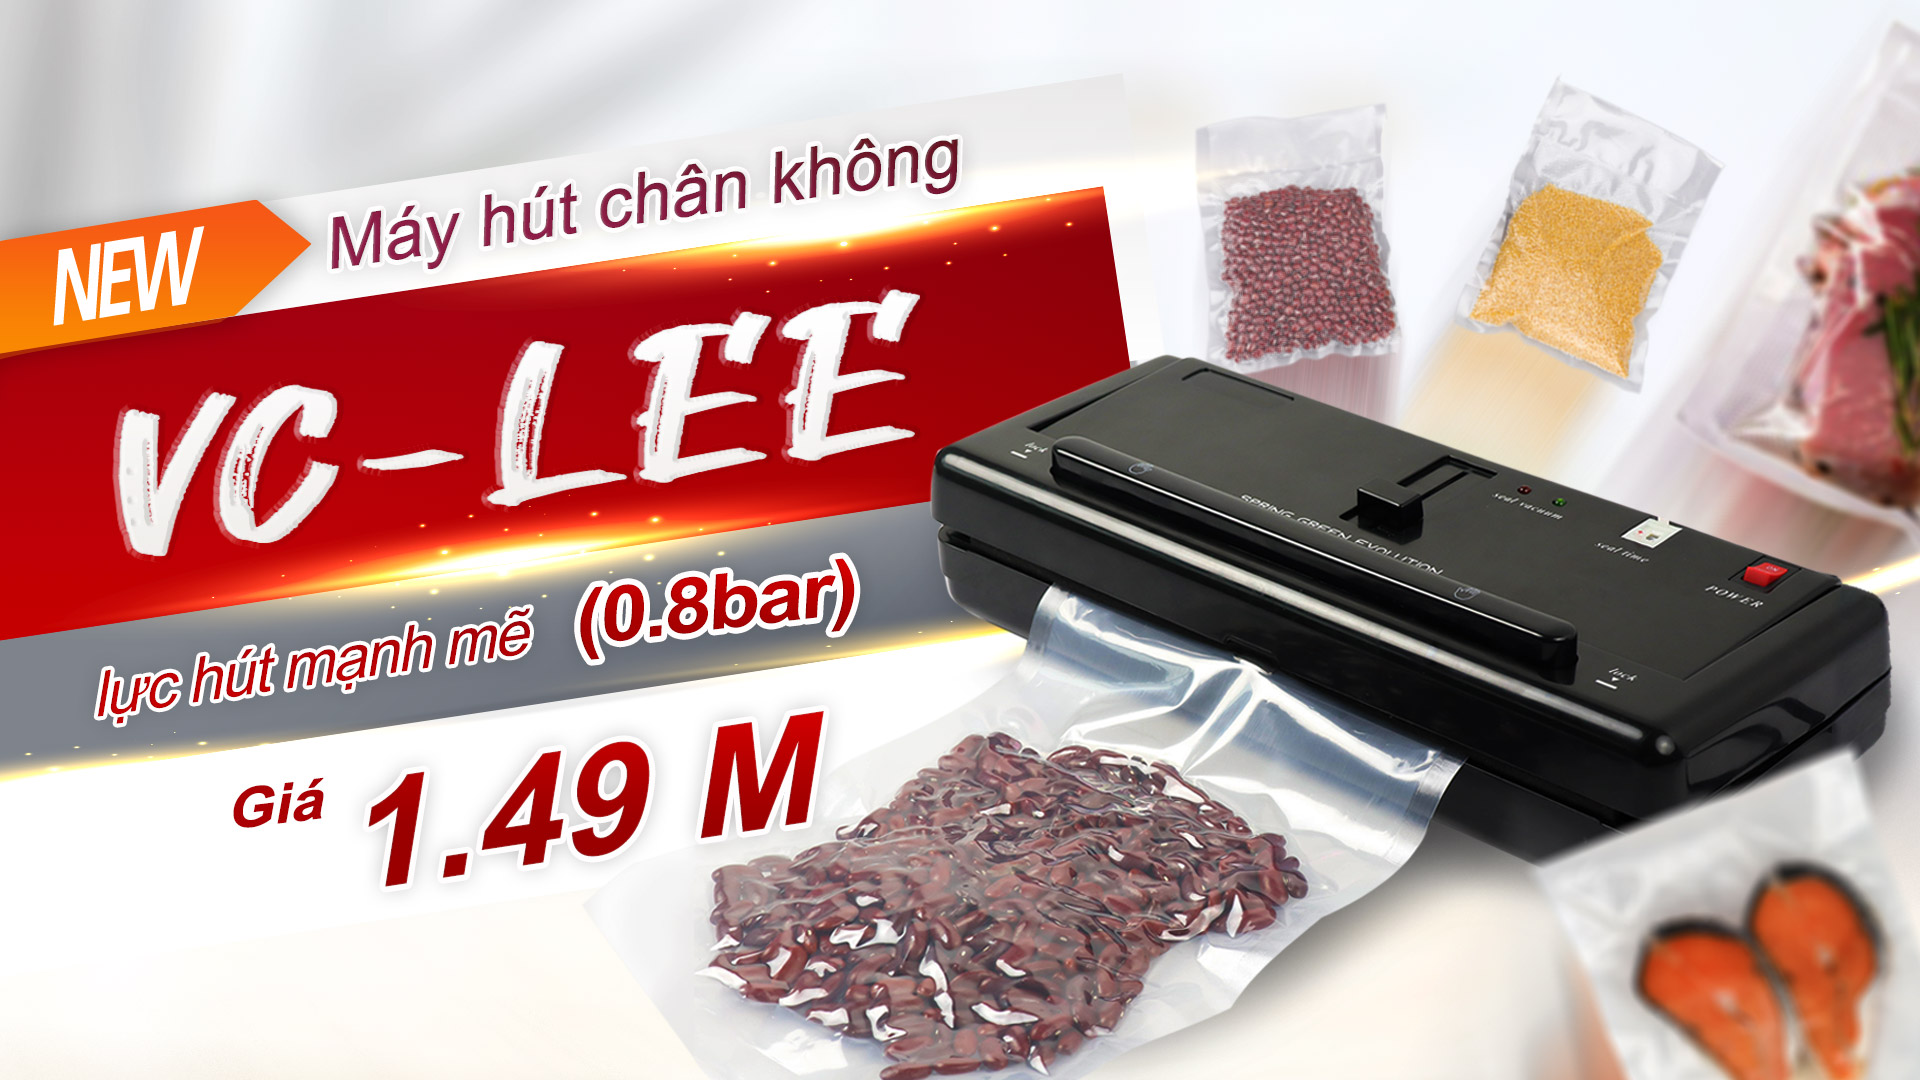 Banner-VC-LEE-ราคา-VN